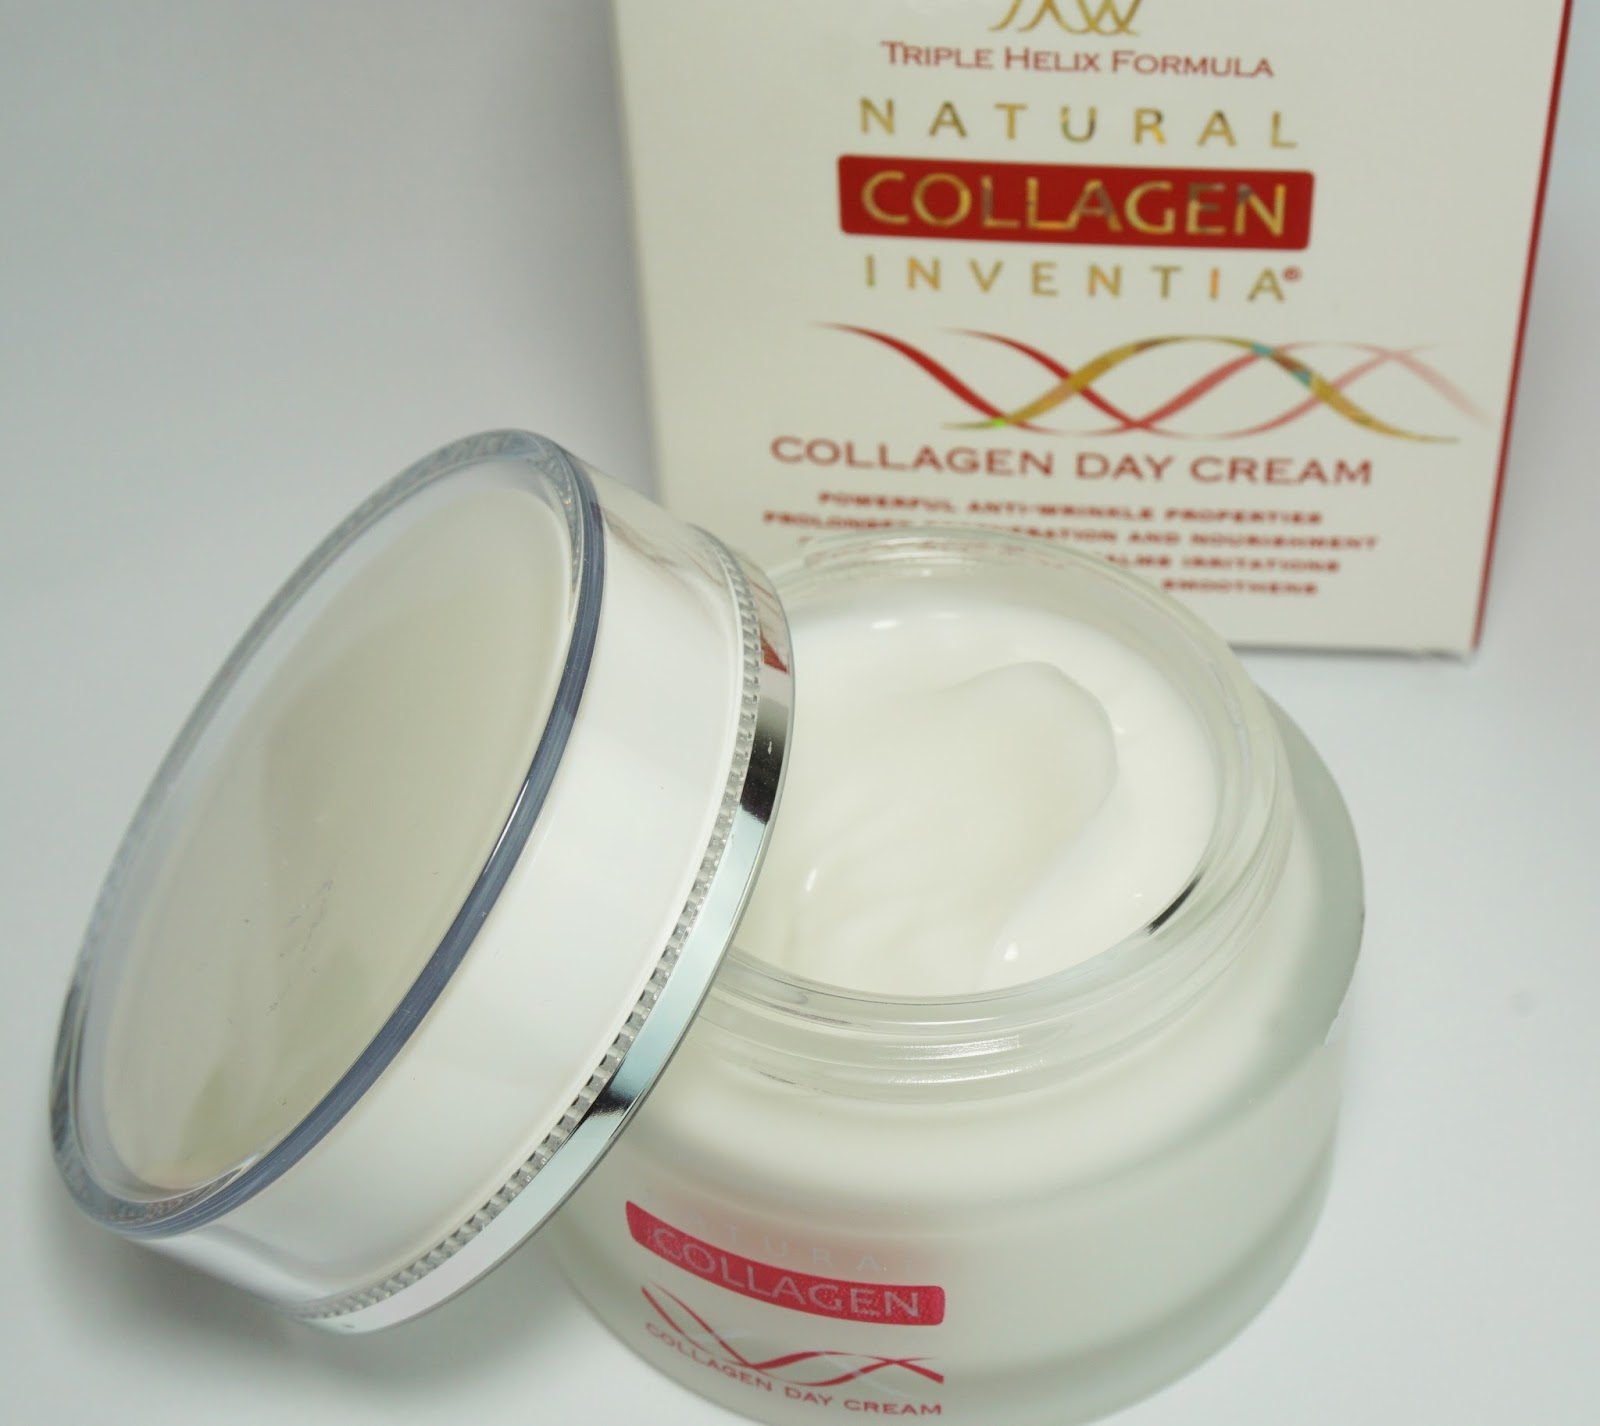 Natural Collagen Inventia - Tagescreme